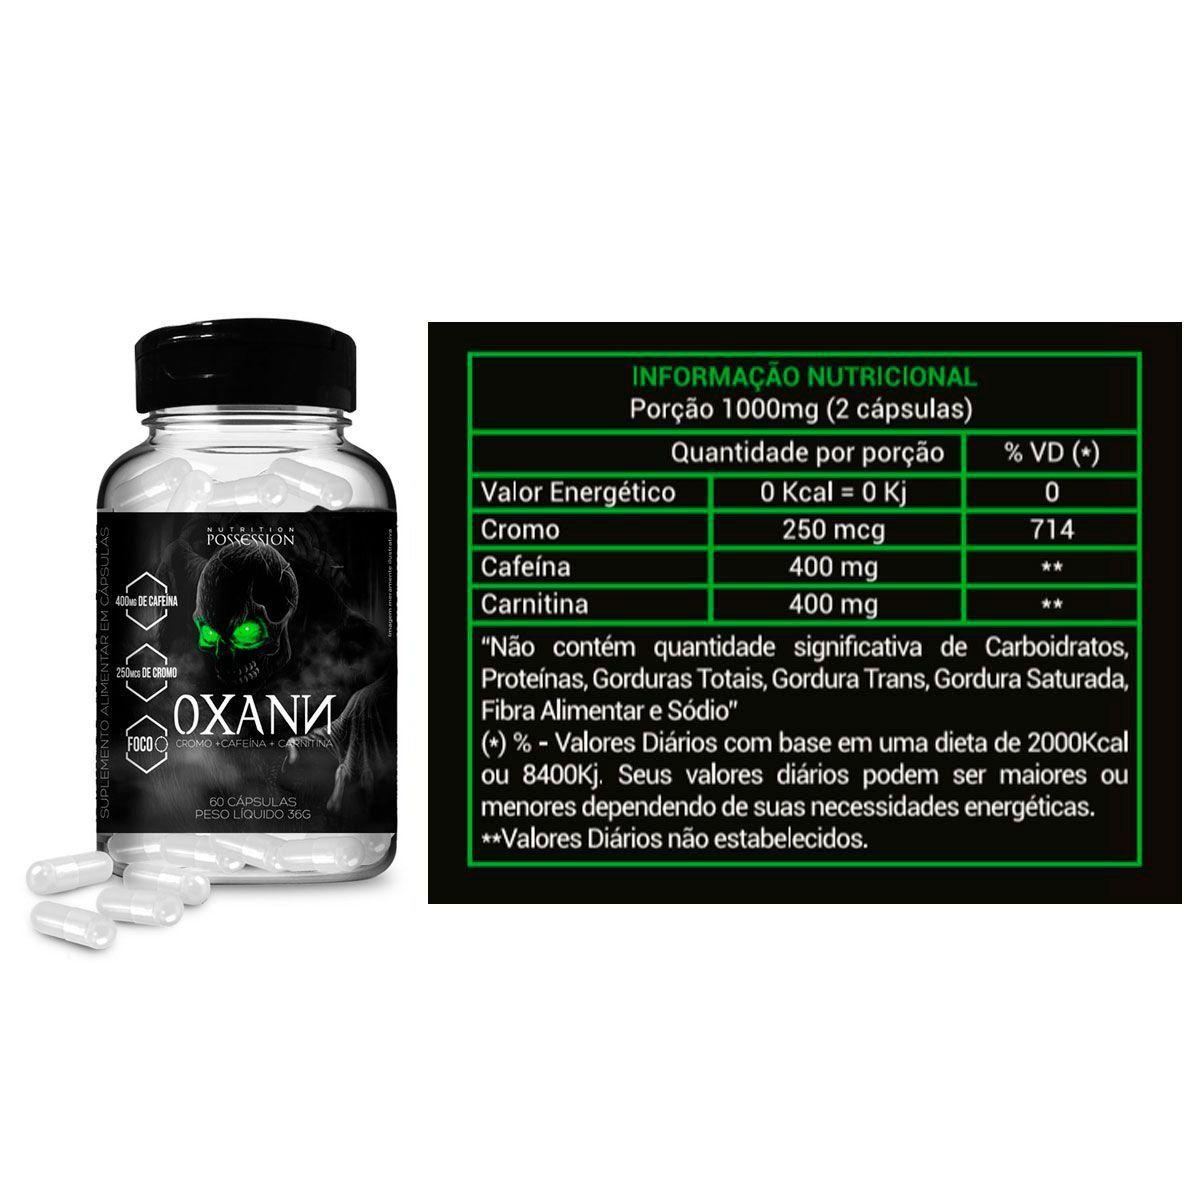 Kit Emagrecedor Oxann 60 Caps + Regata Cavada + Coq - Possession Nutrition